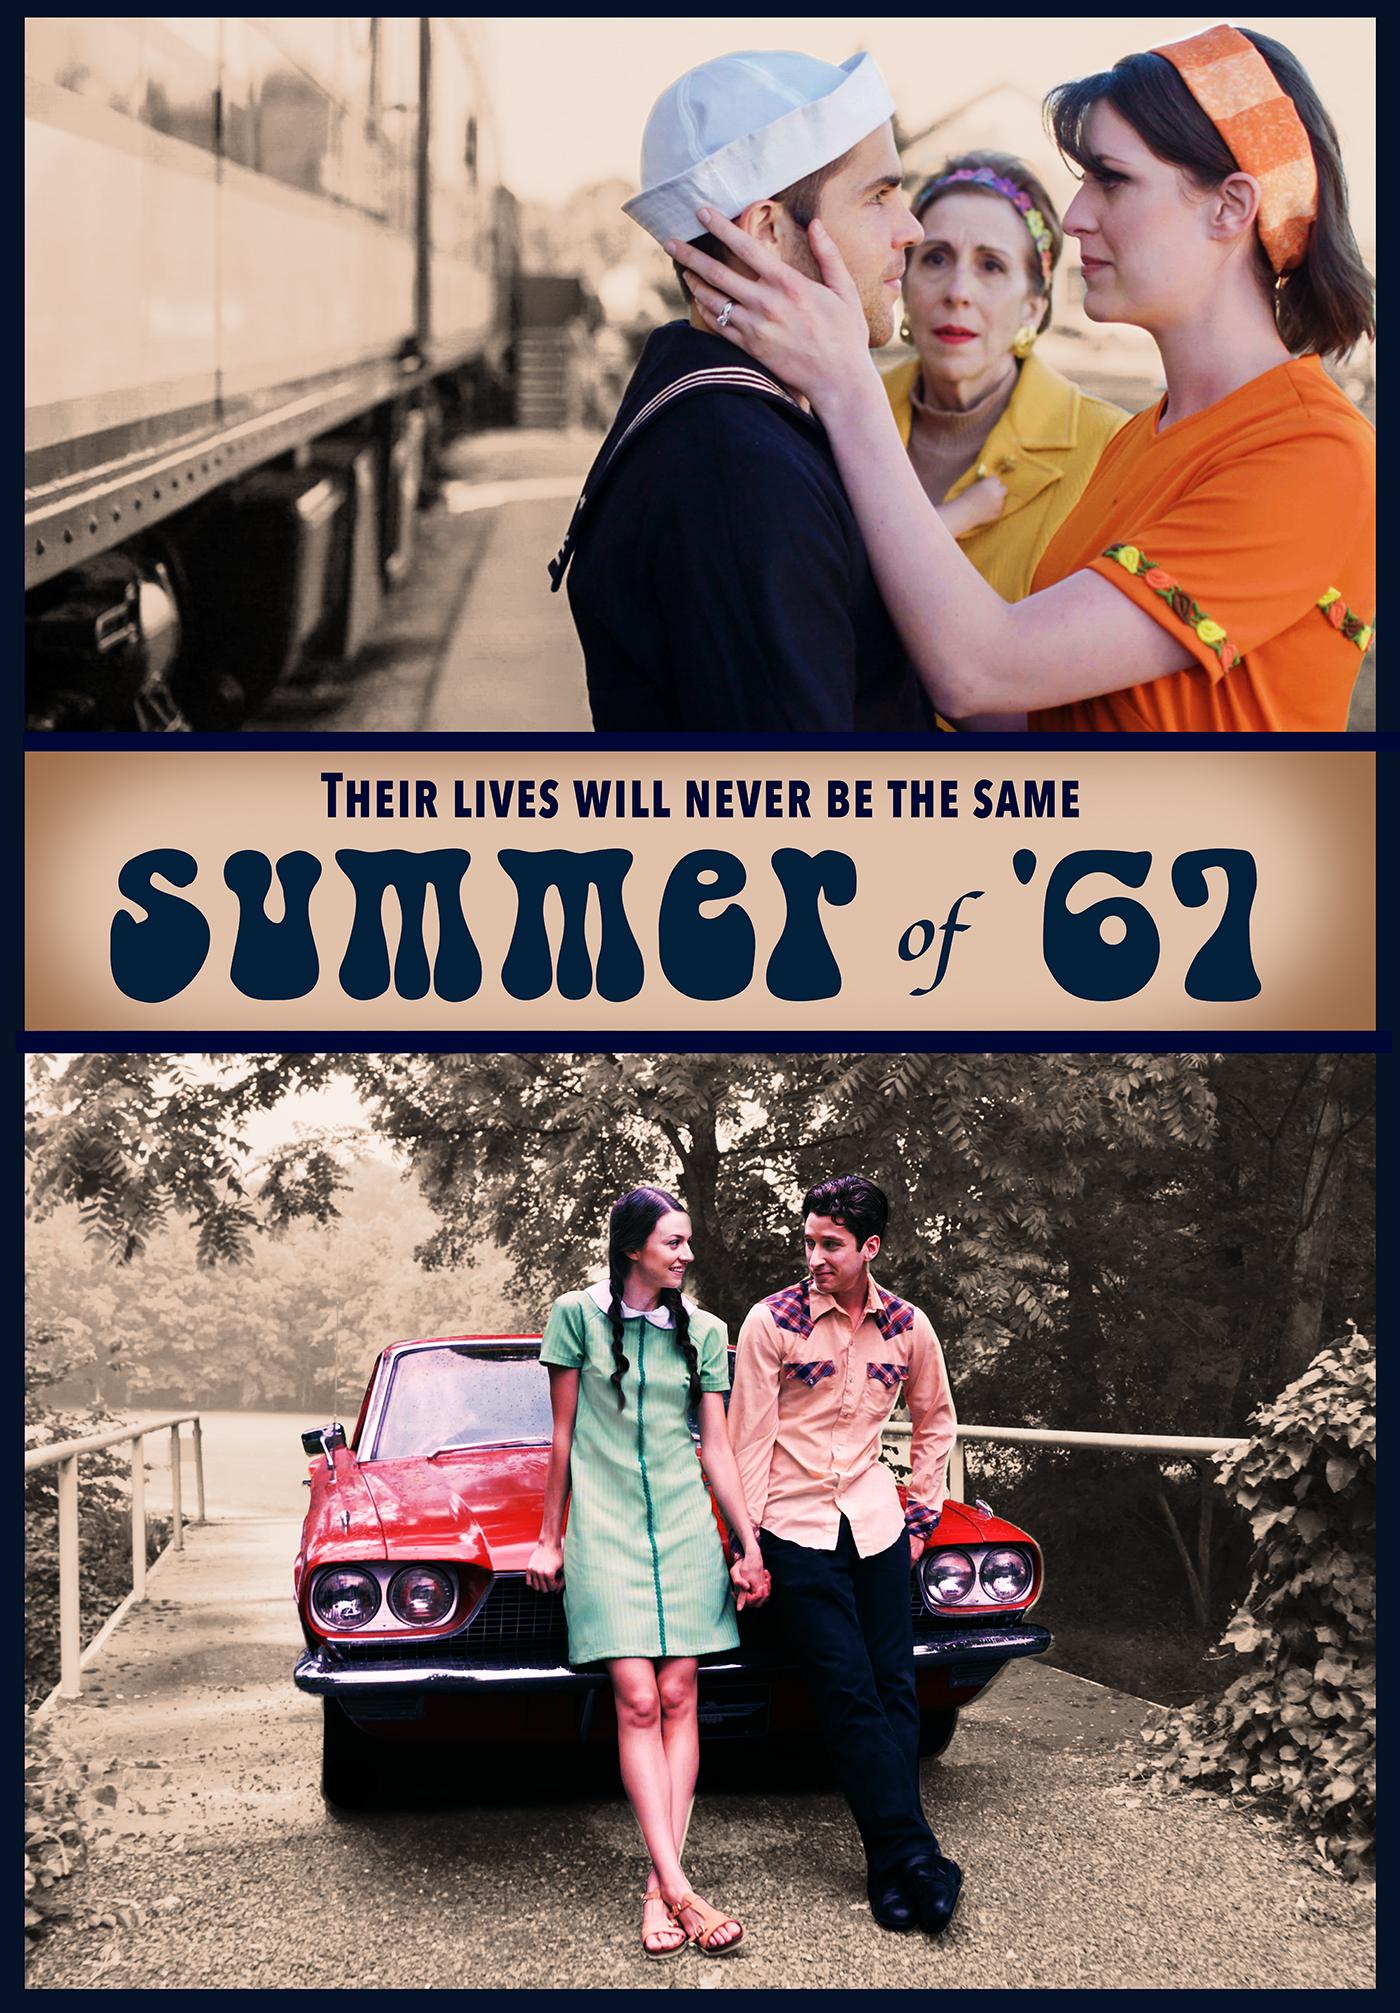 Mimi Sagadin, Cameron Gilliam, Rachel Schrey, and Bethany Davenport in Summer of '67 (2018)